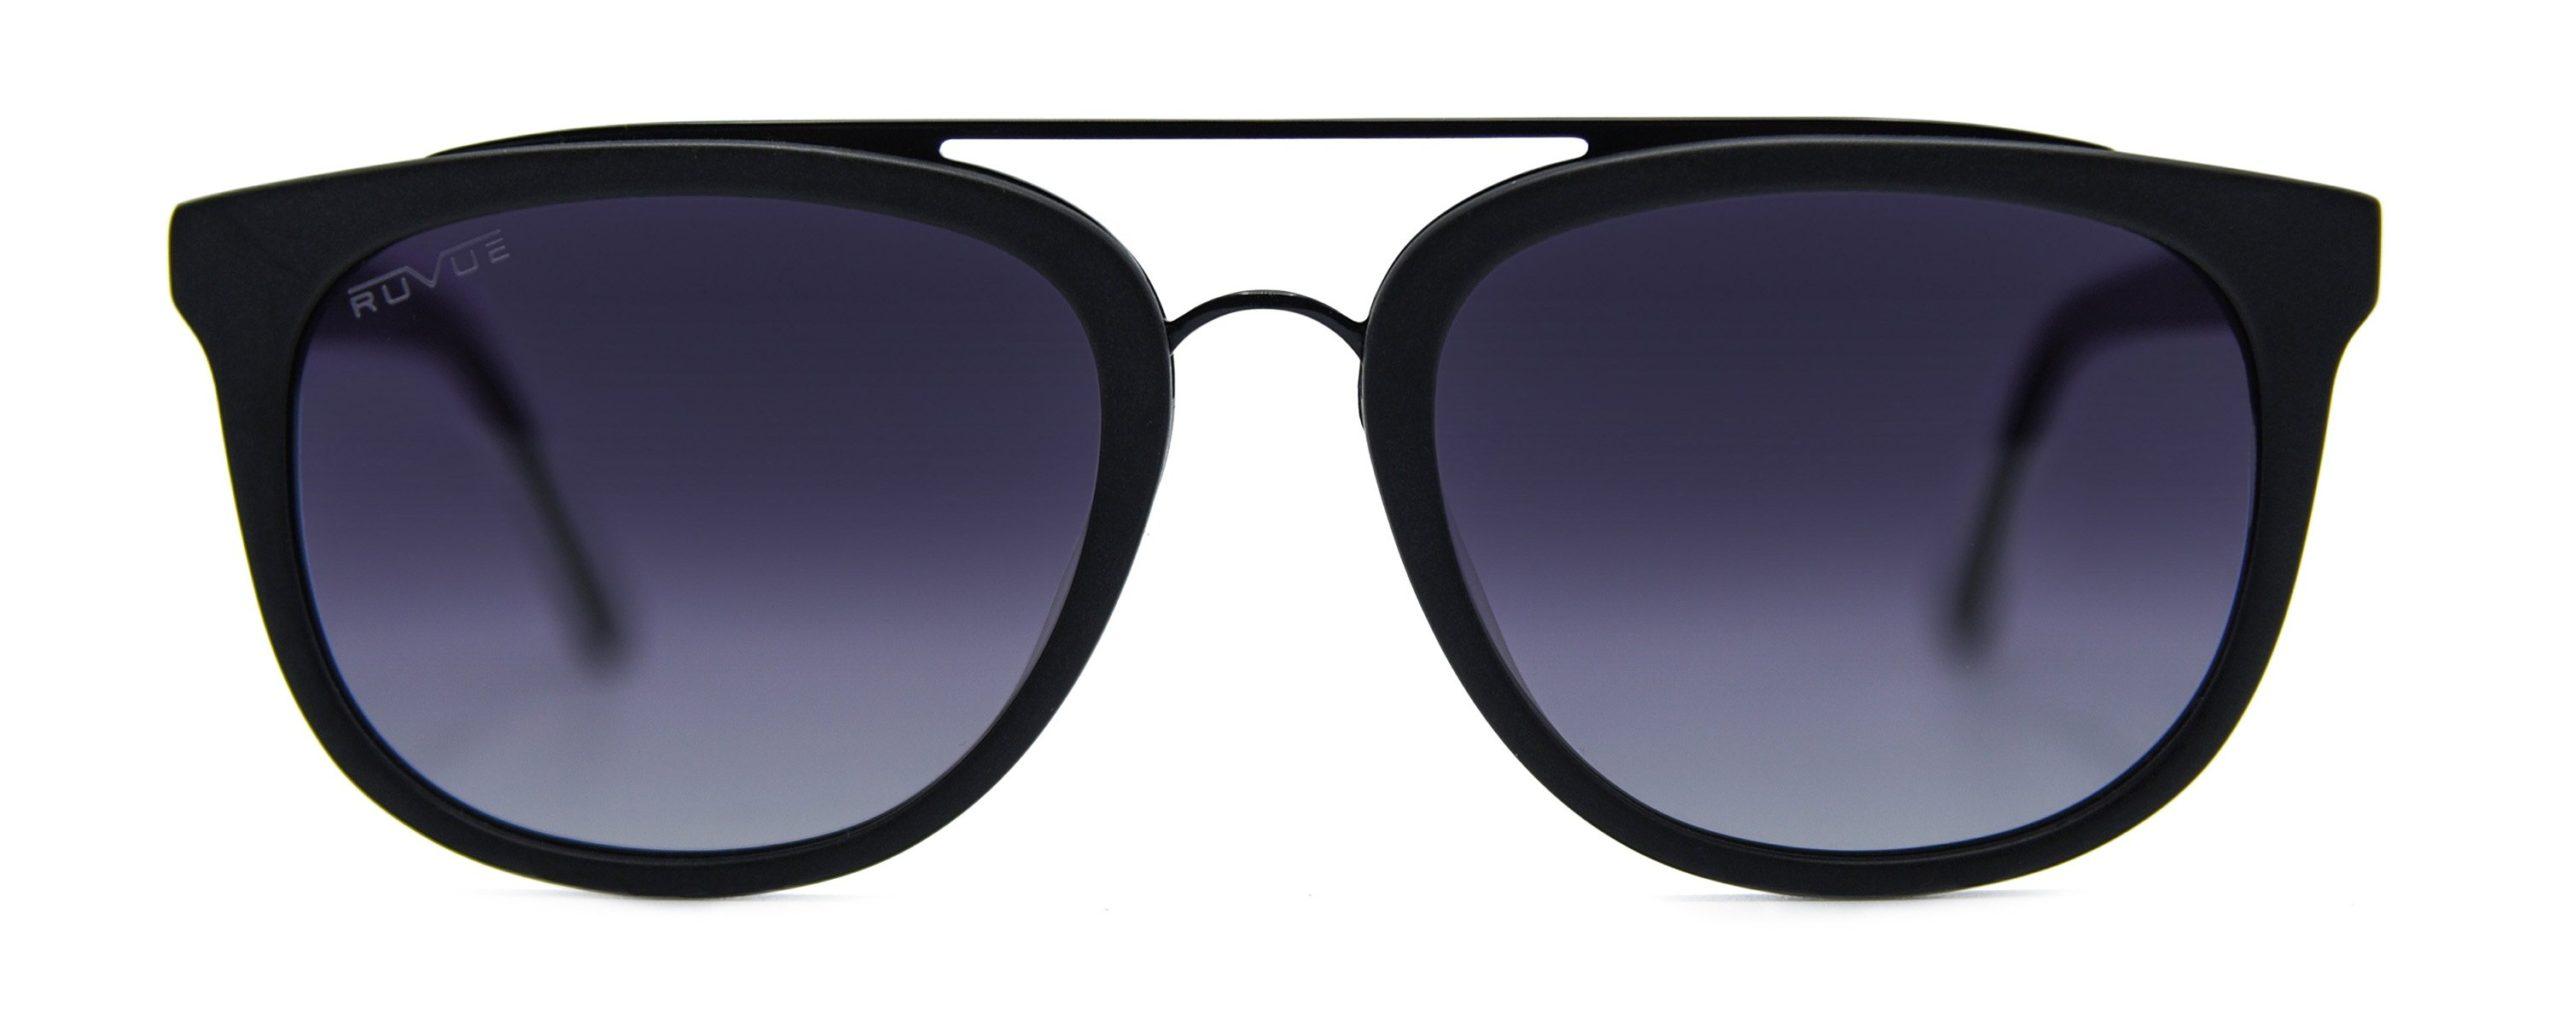 Zena - Matte Black - Black Gradient Polarized Grey Lenses - Front